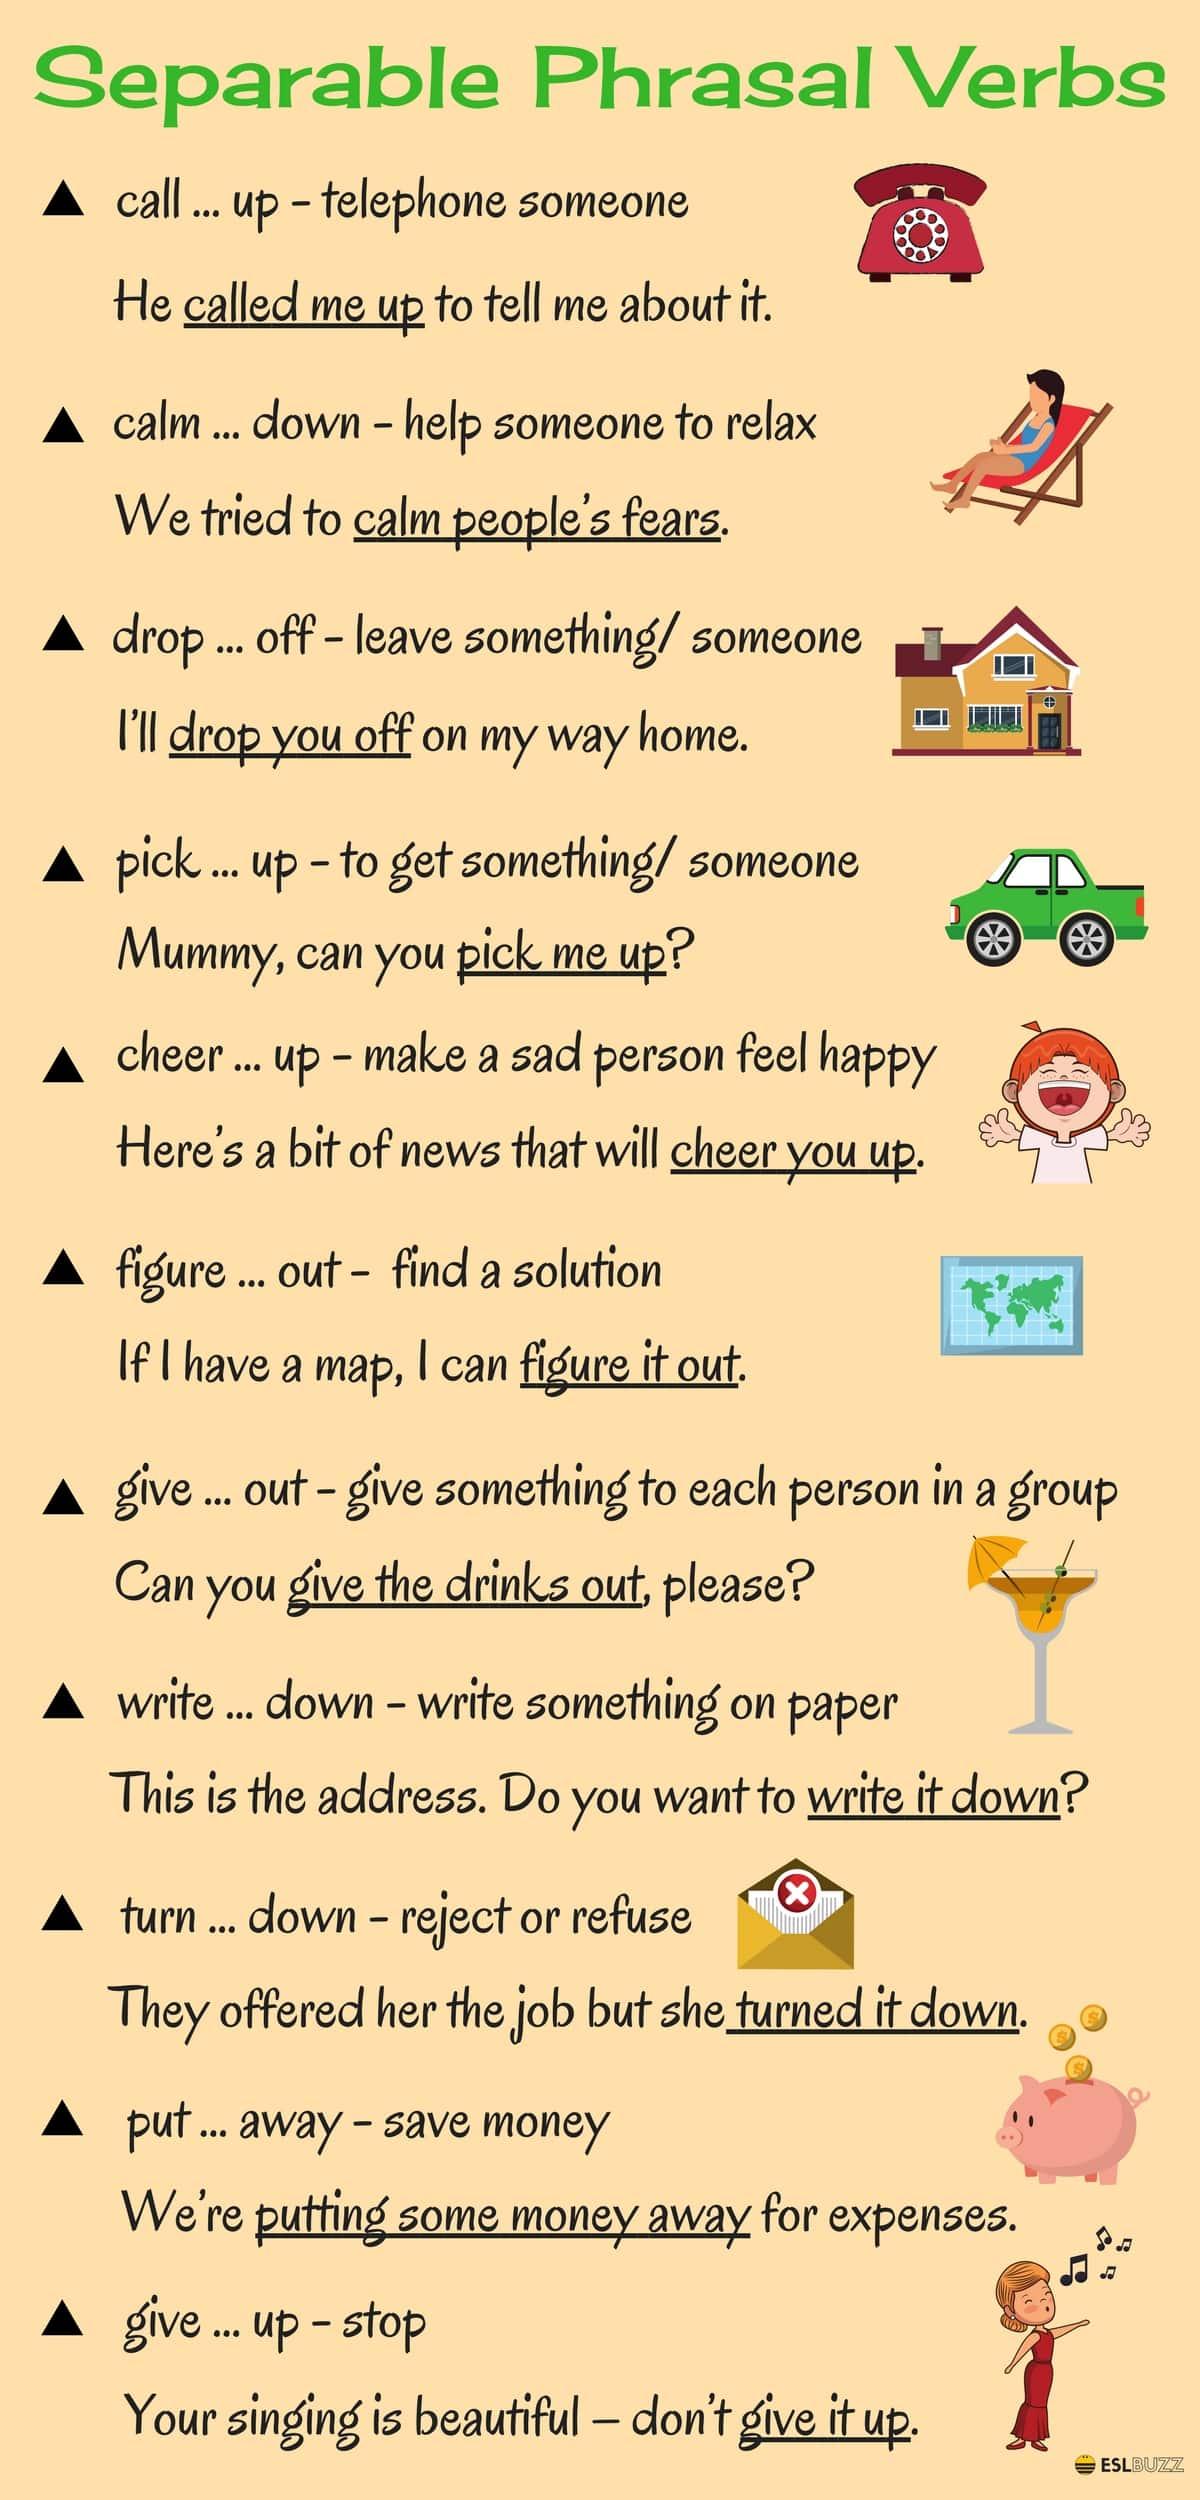 Learn 20 Separable Phrasal Verbs In English